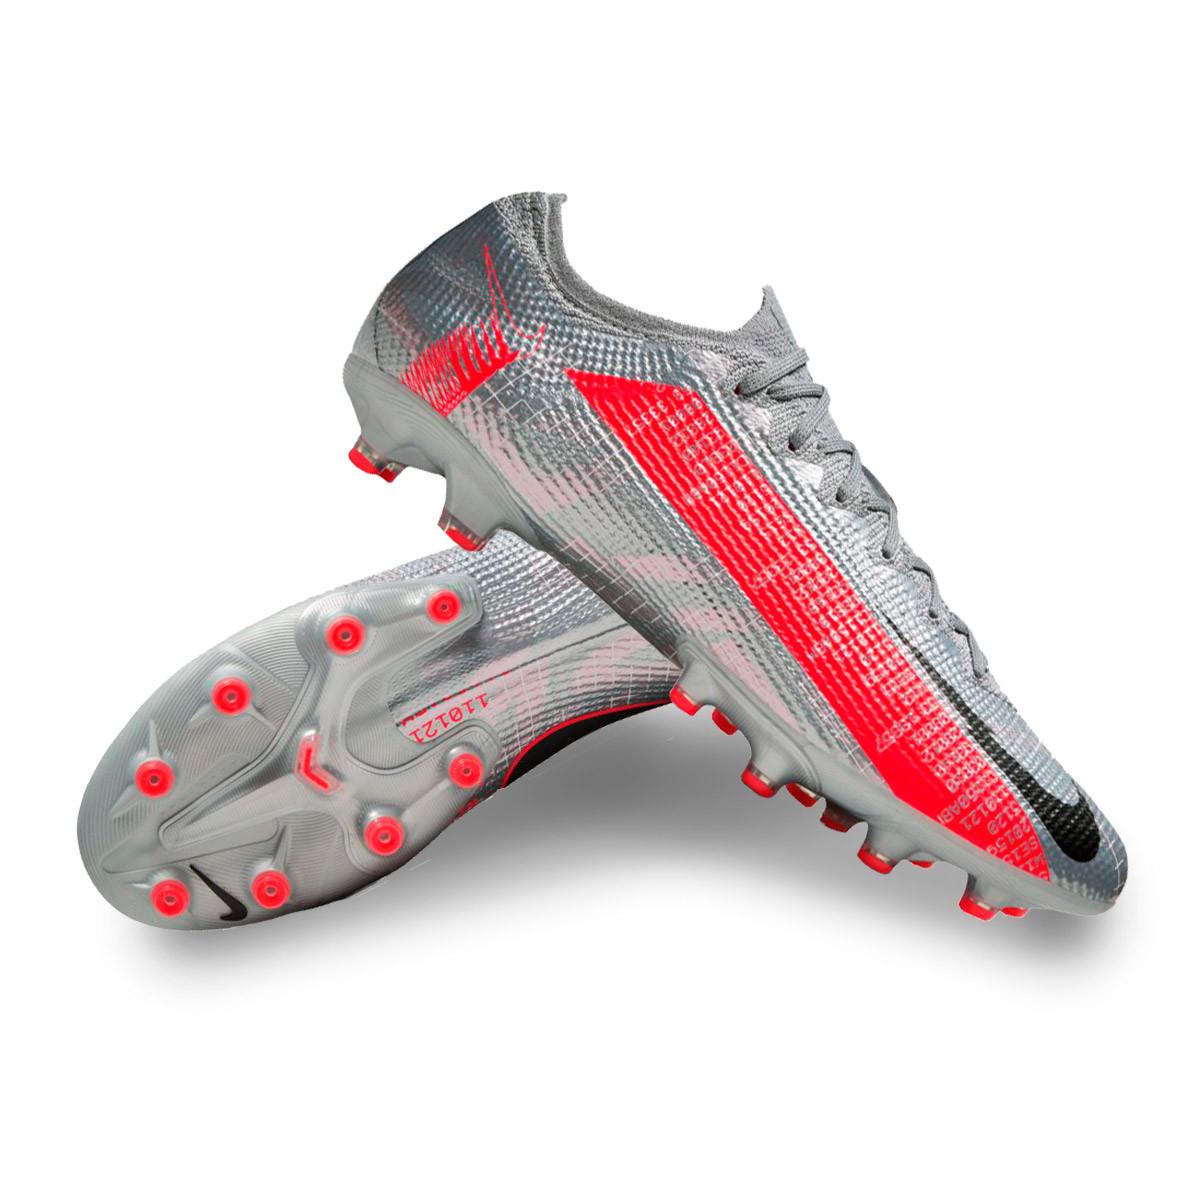 emitir Saturar masculino  Football Boots Nike Mercurial Vapor XIII Elite AG-Pro Metallic bomber  grey-Black-Particle grey-Lase - Football store Fútbol Emotion